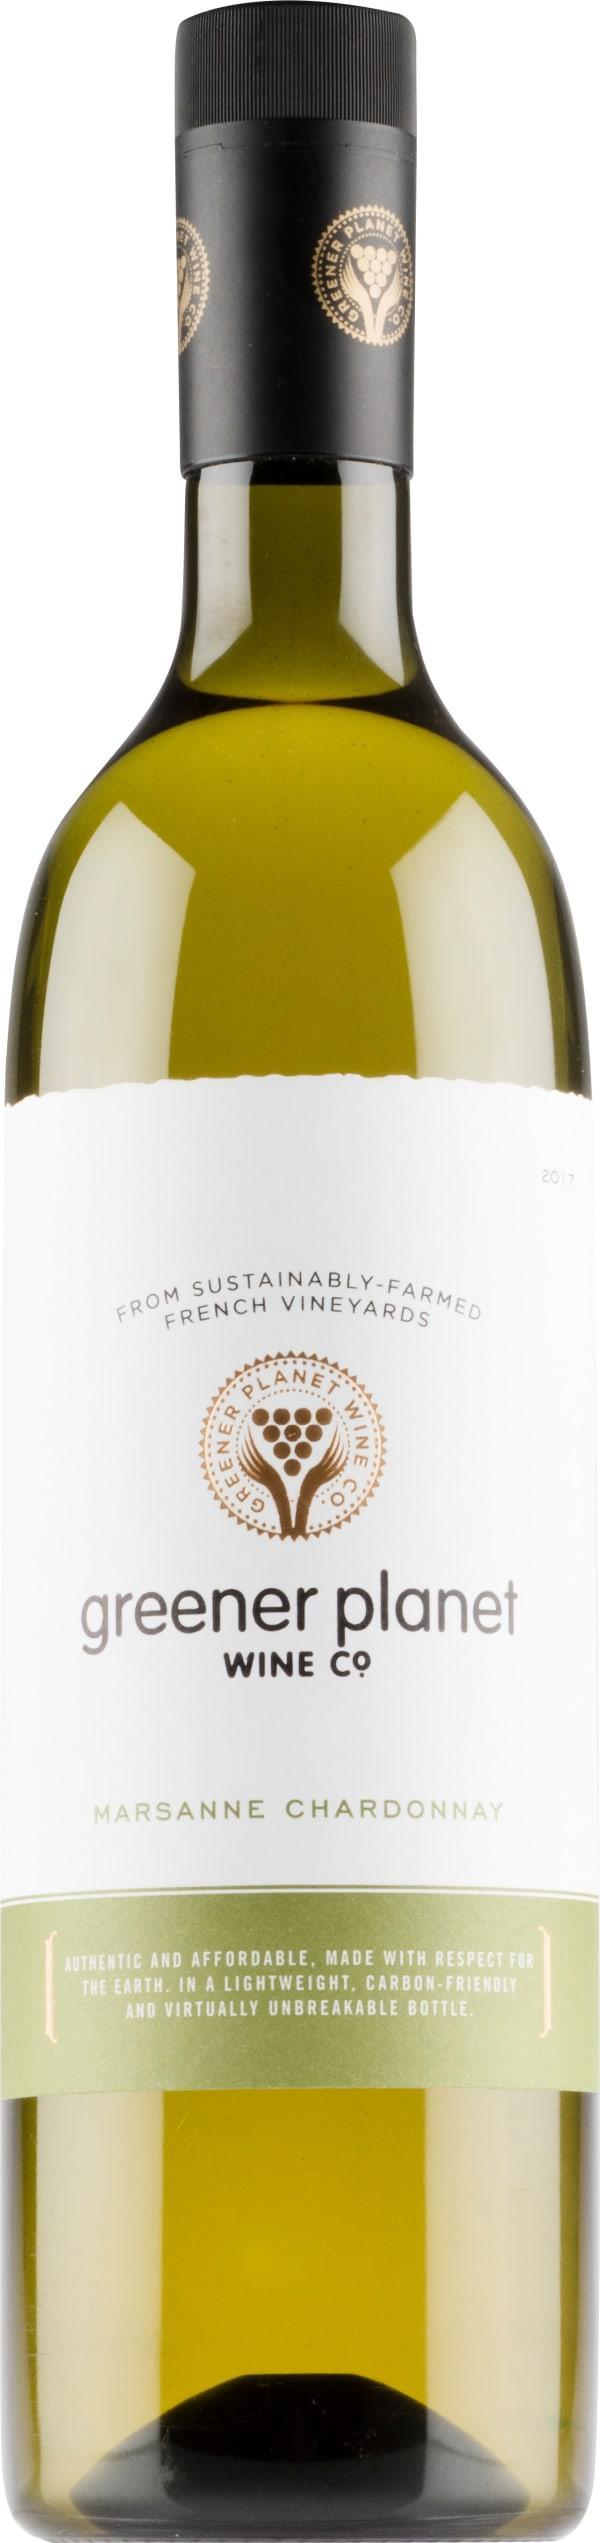 Greener Planet Marsanne Chardonnay 2017 muovipullo